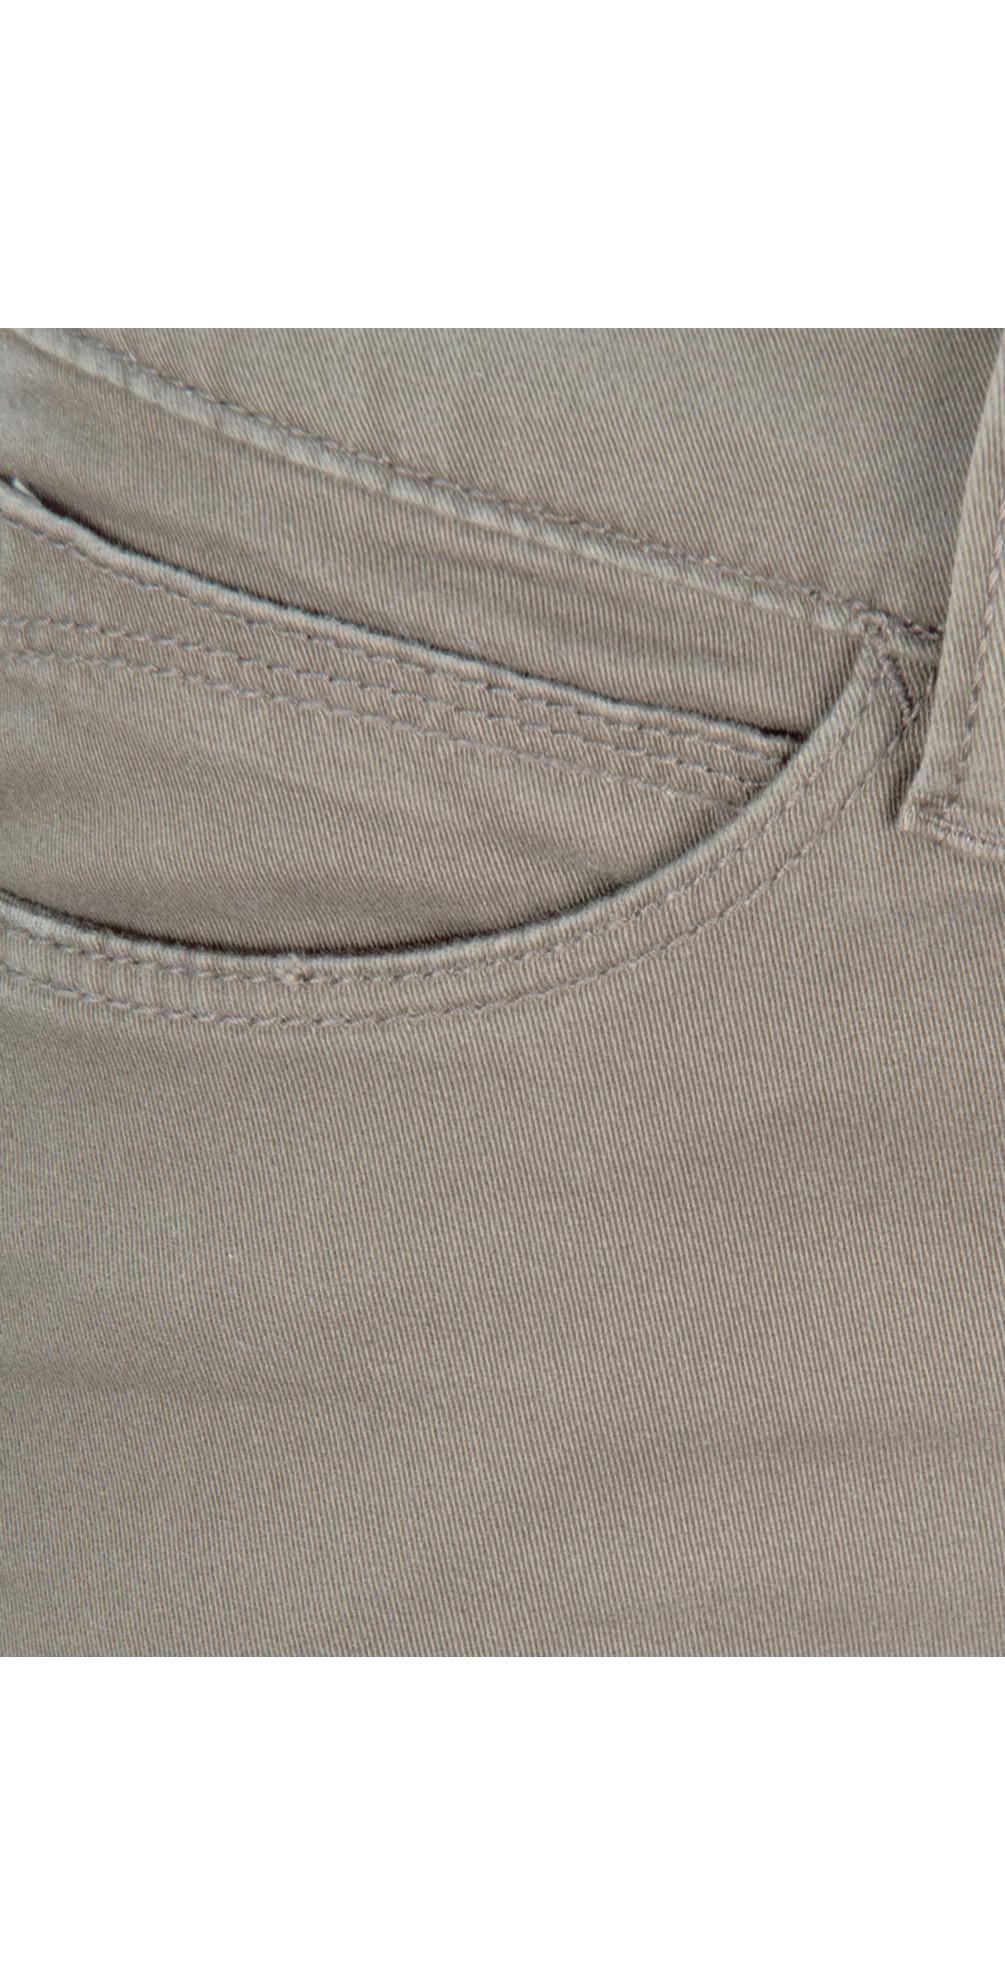 Skinny Cotton Stretch Pants main image